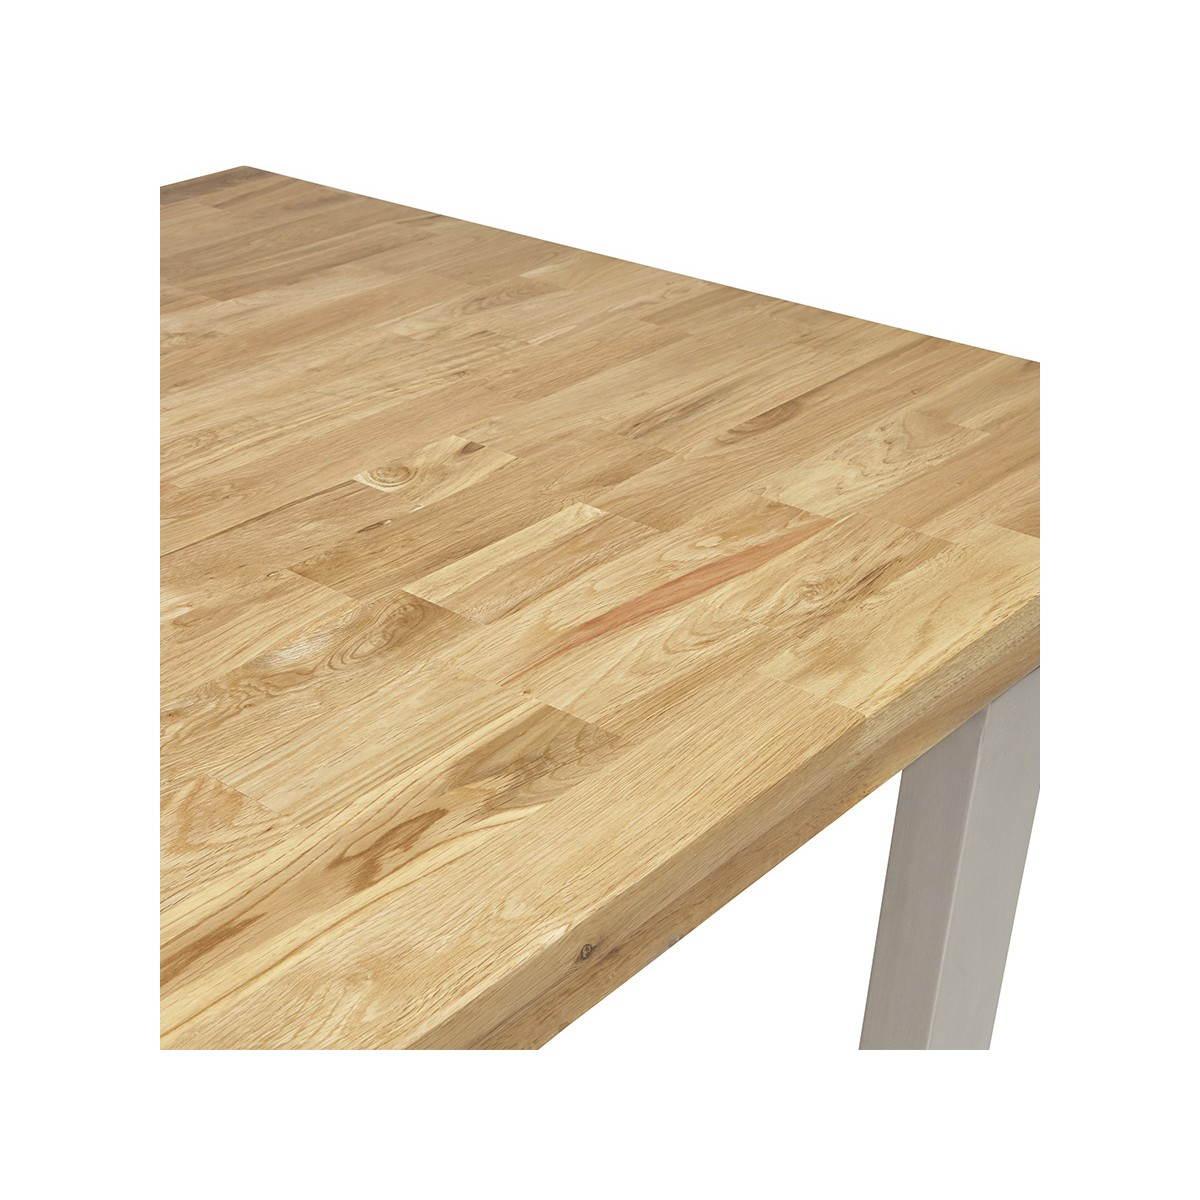 Table moderne rectangulaire panou en ch ne massif bois naturel fran ais french - Table en chene massif moderne ...